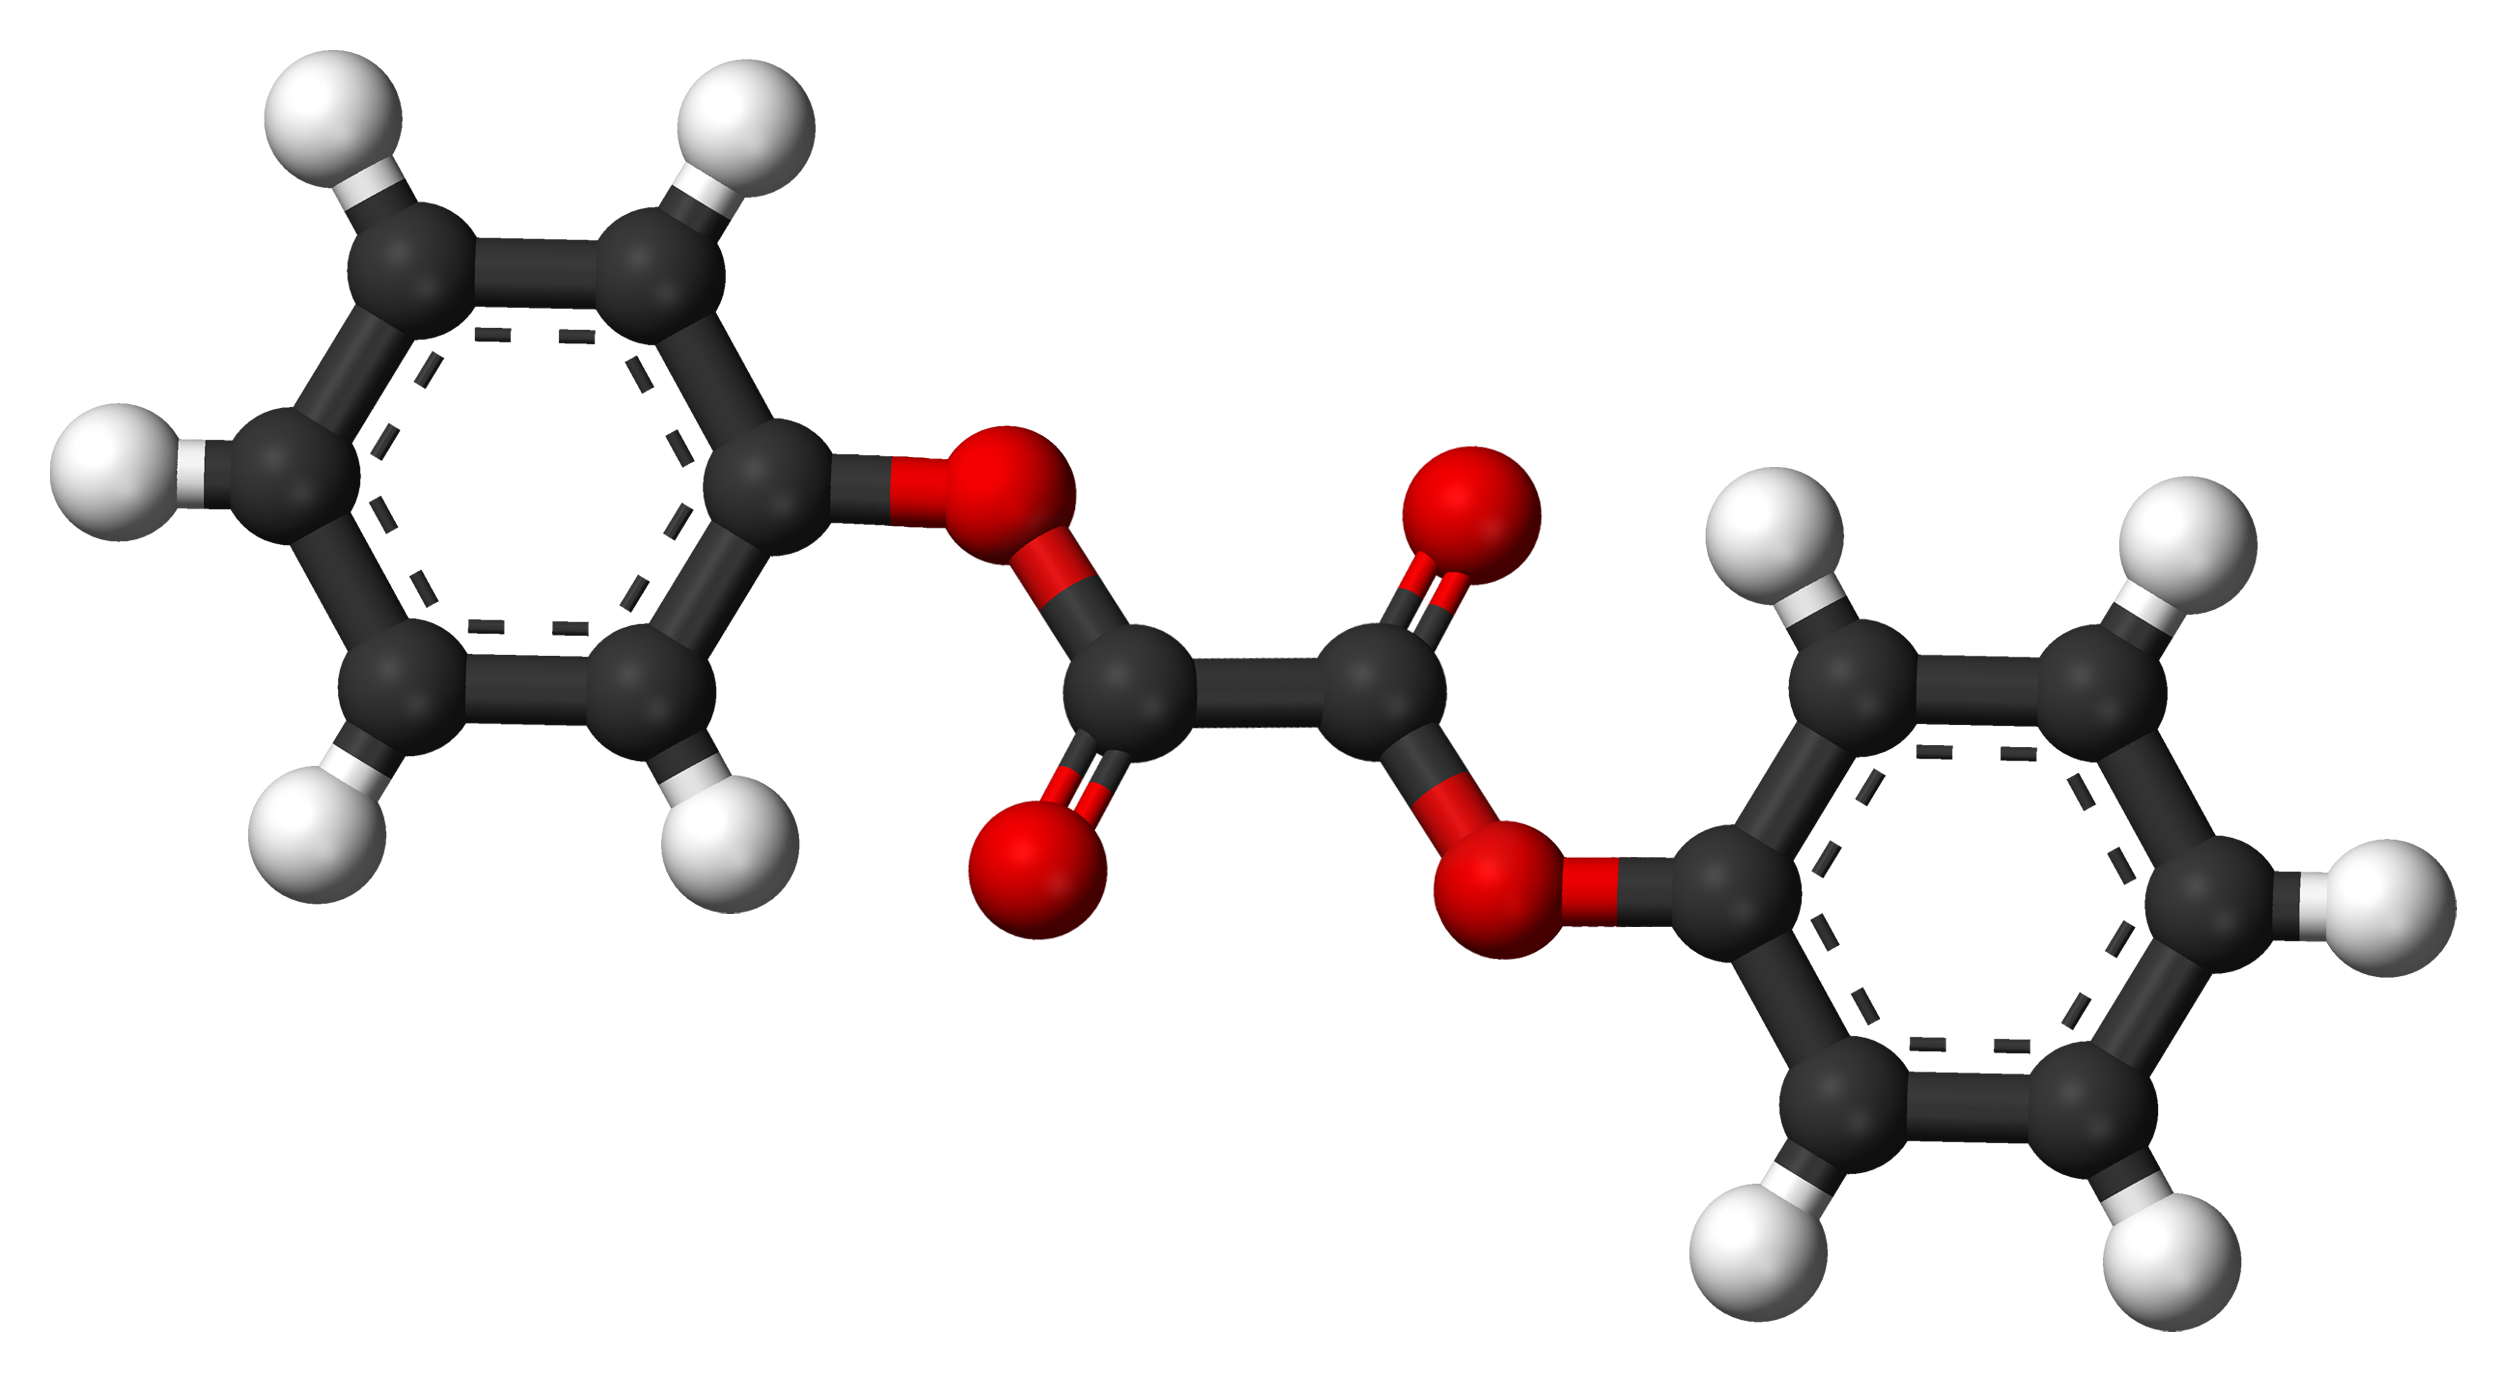 Phenyl Oxalate Ester Phenyl Oxalate Ester by Emily